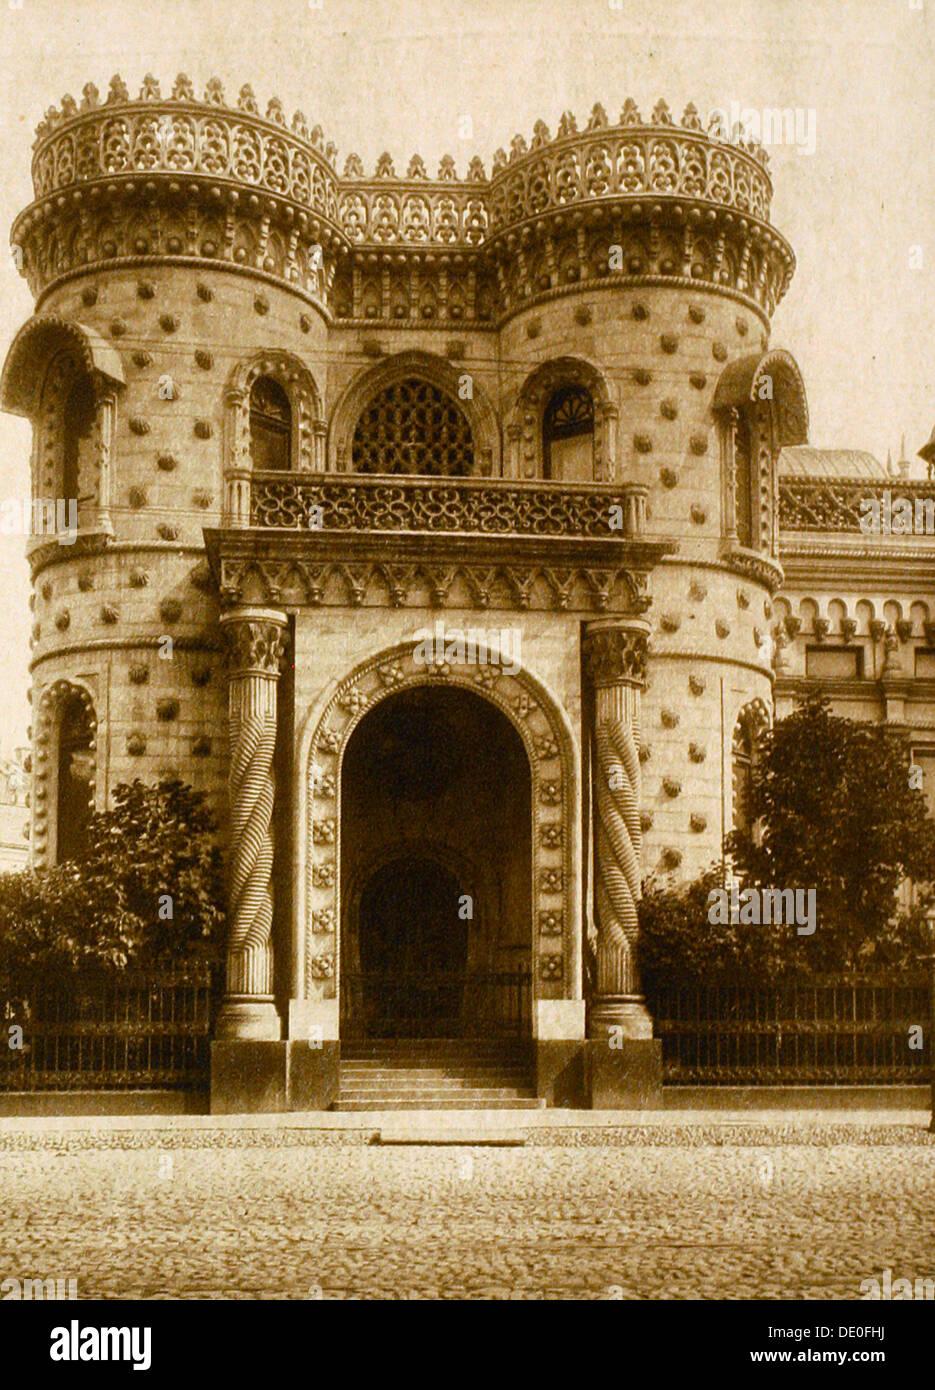 The Morozov House, Vozdvizhenka Street, Moscow, Russia, early 20th century. - Stock Image